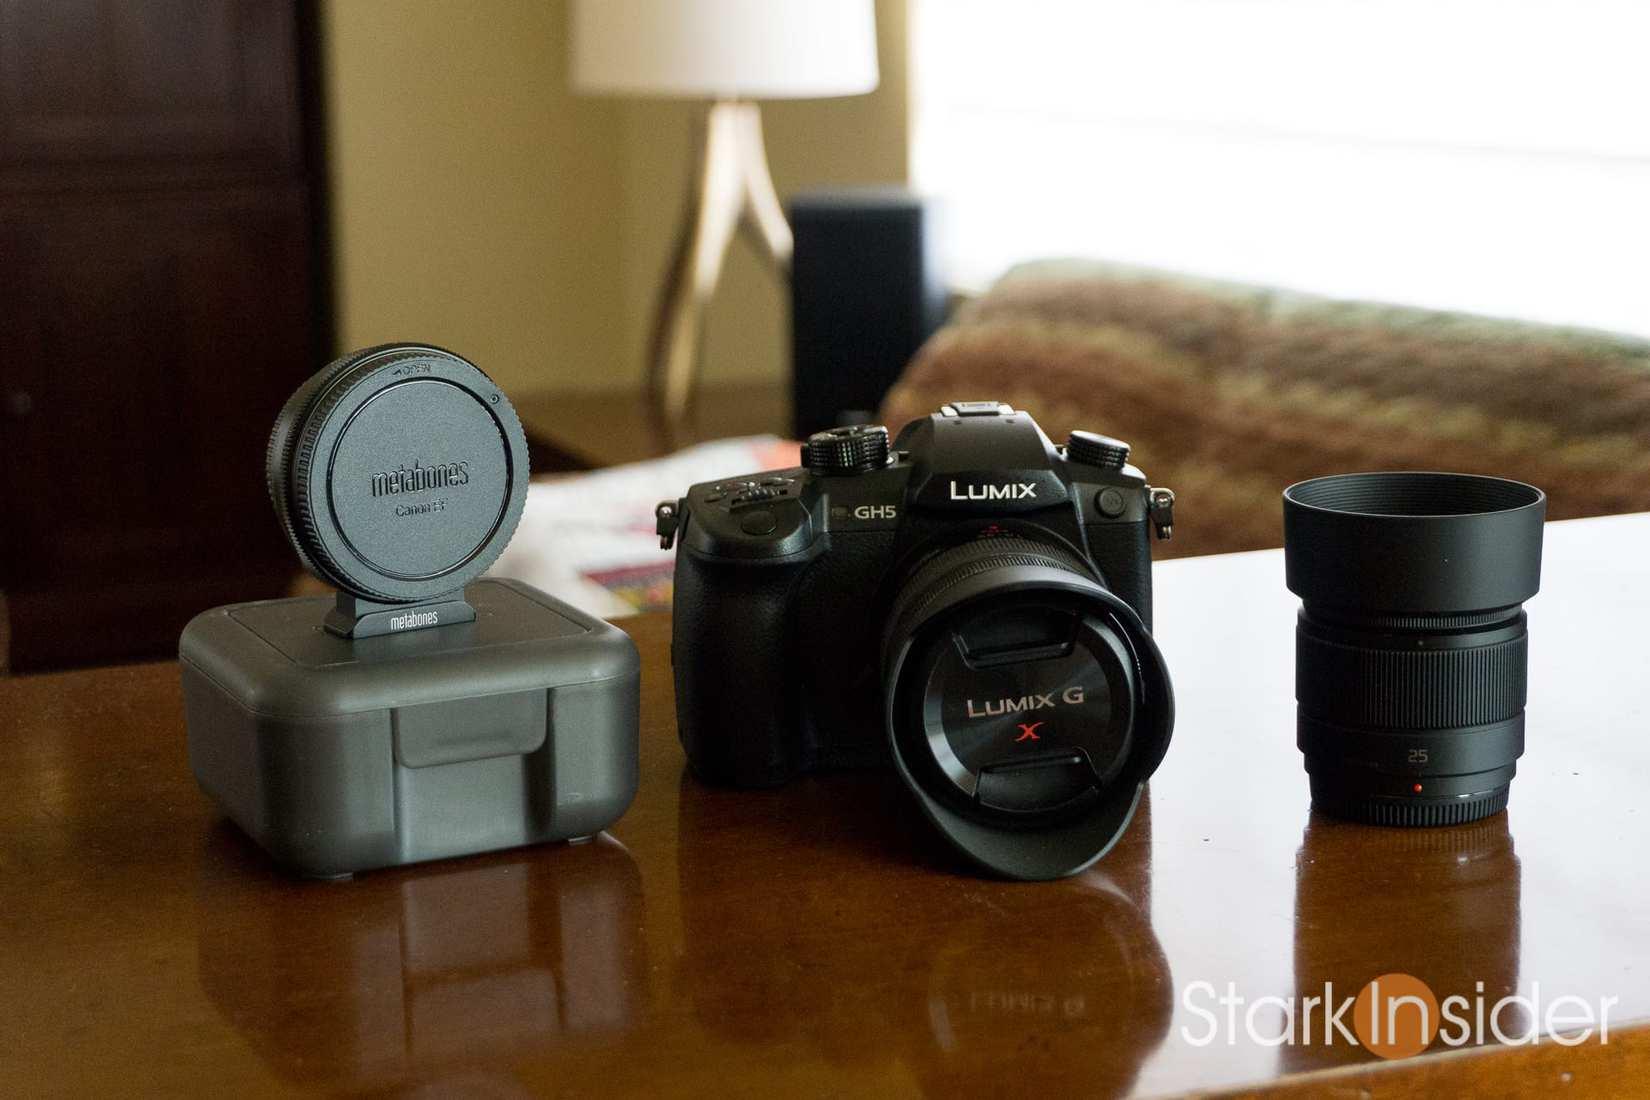 Panasonic GH5: The perfect cinema-like camera for travel